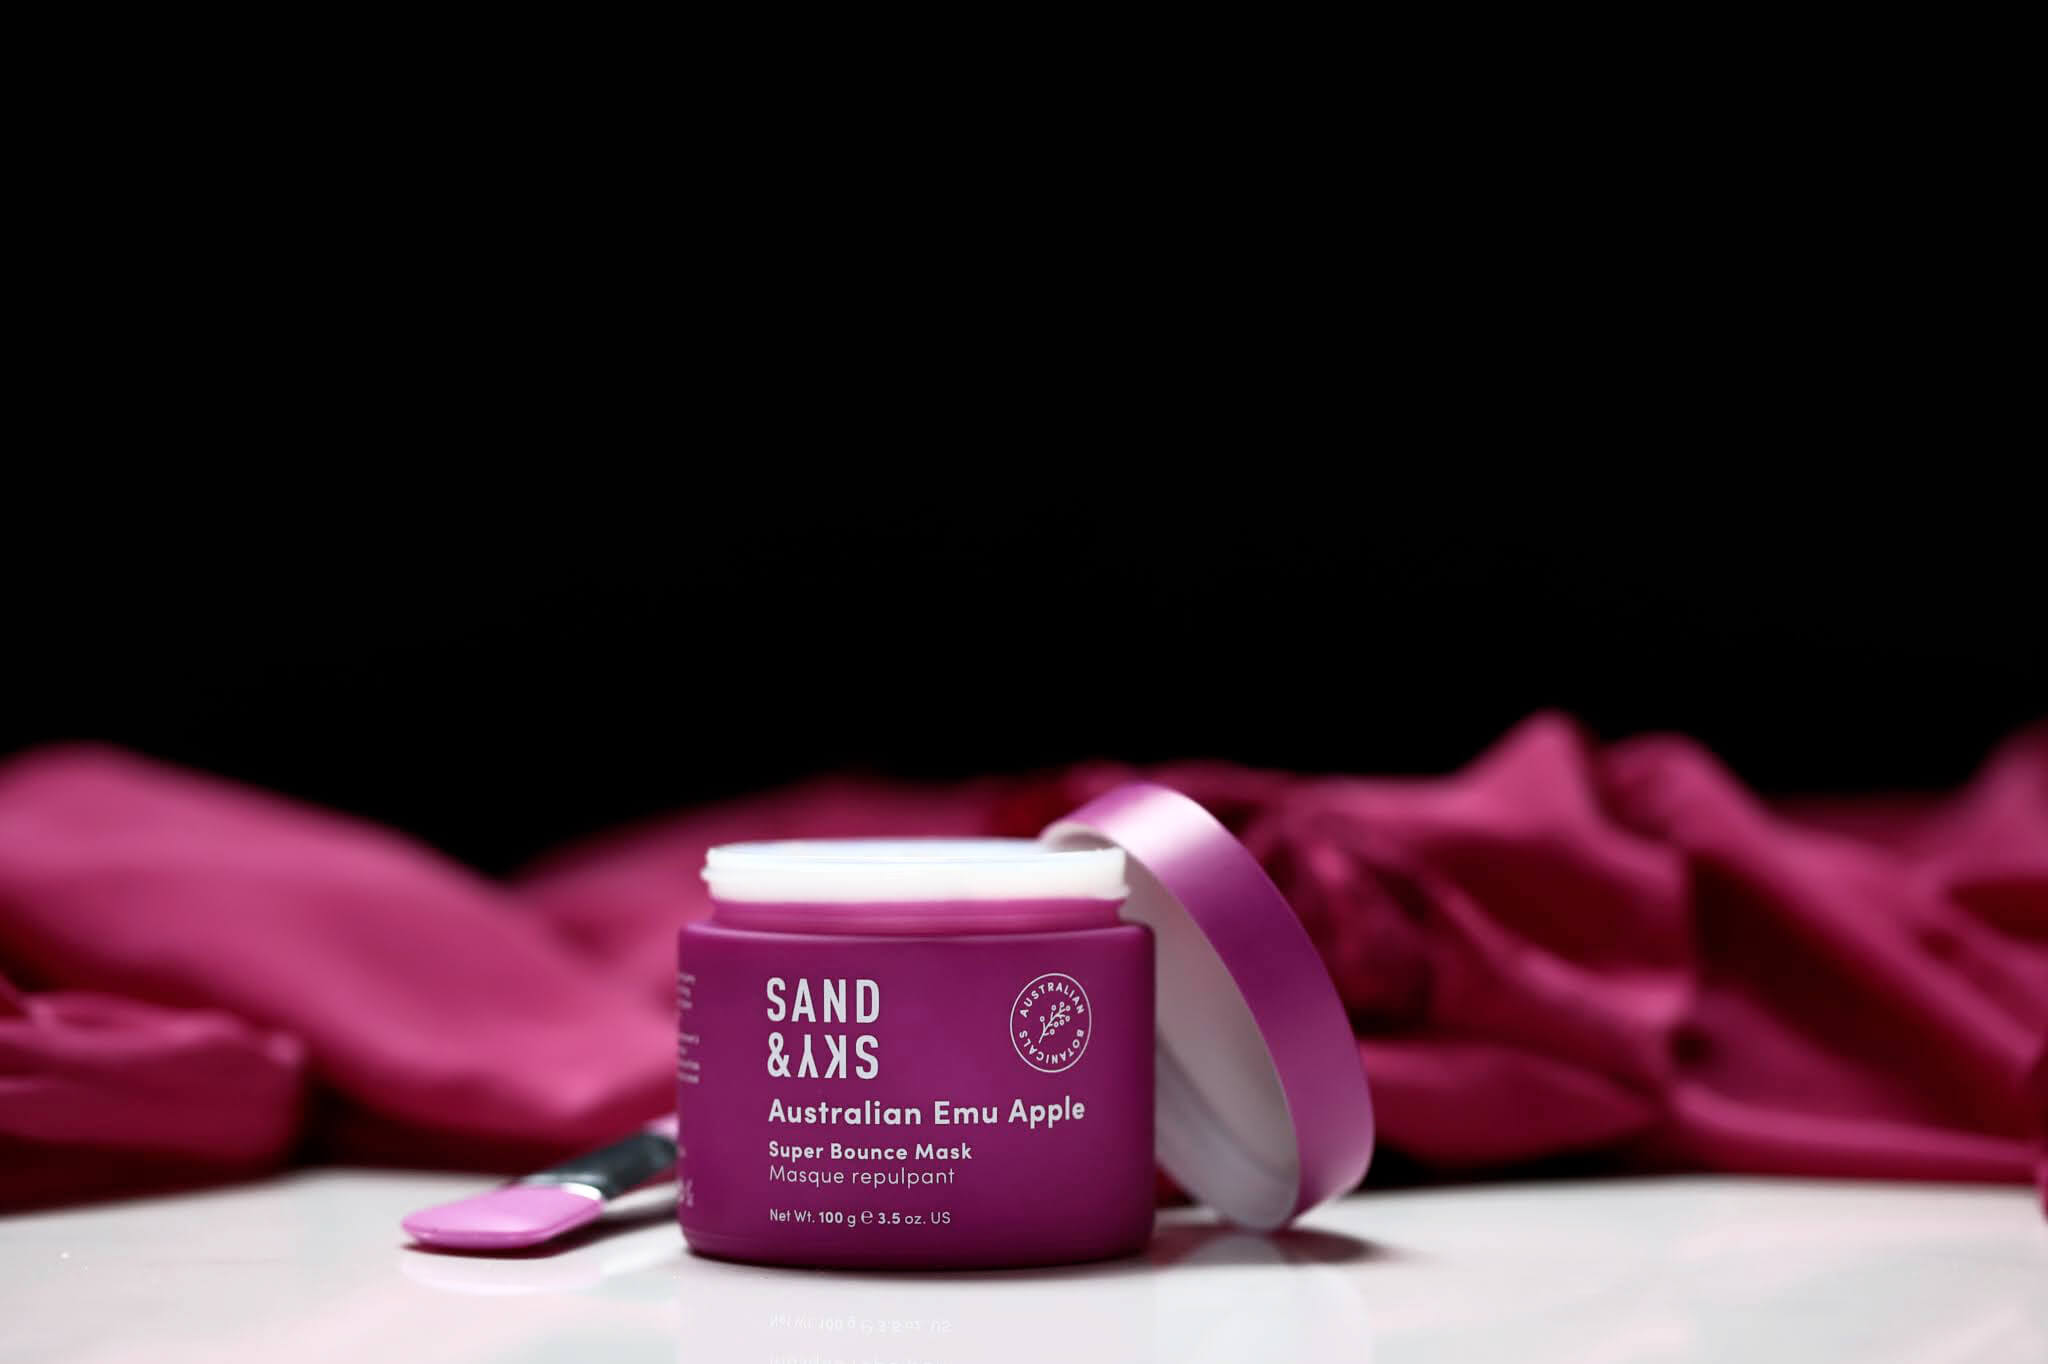 Sand Sky Ausralian Emu Pomme Masque Repulpant